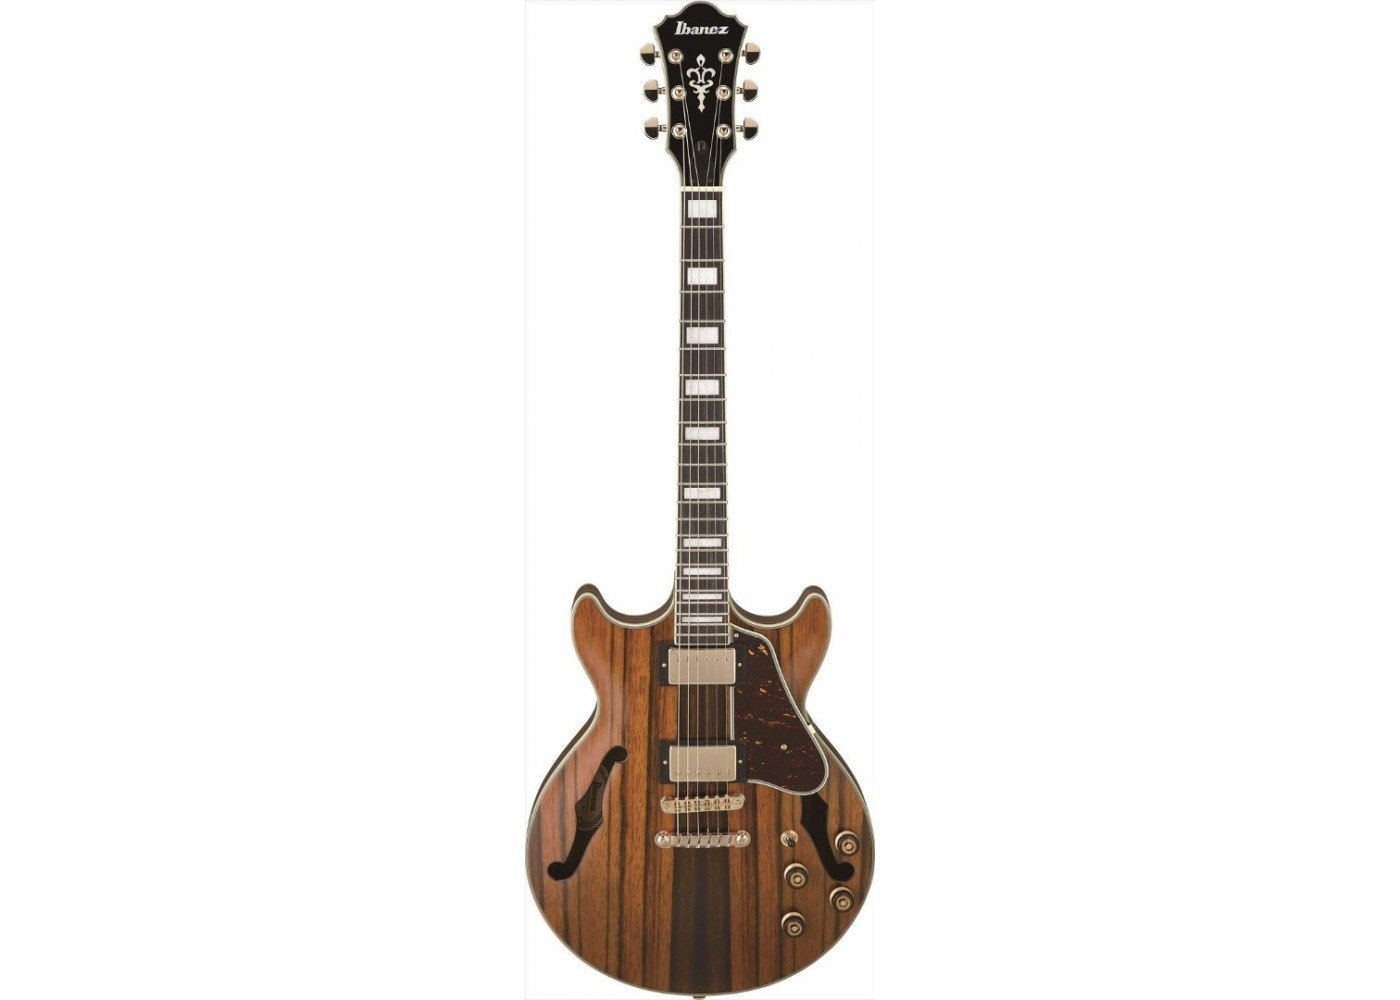 Ibanez AM Artcore Expressionist 6str Electric Guitar - Natural